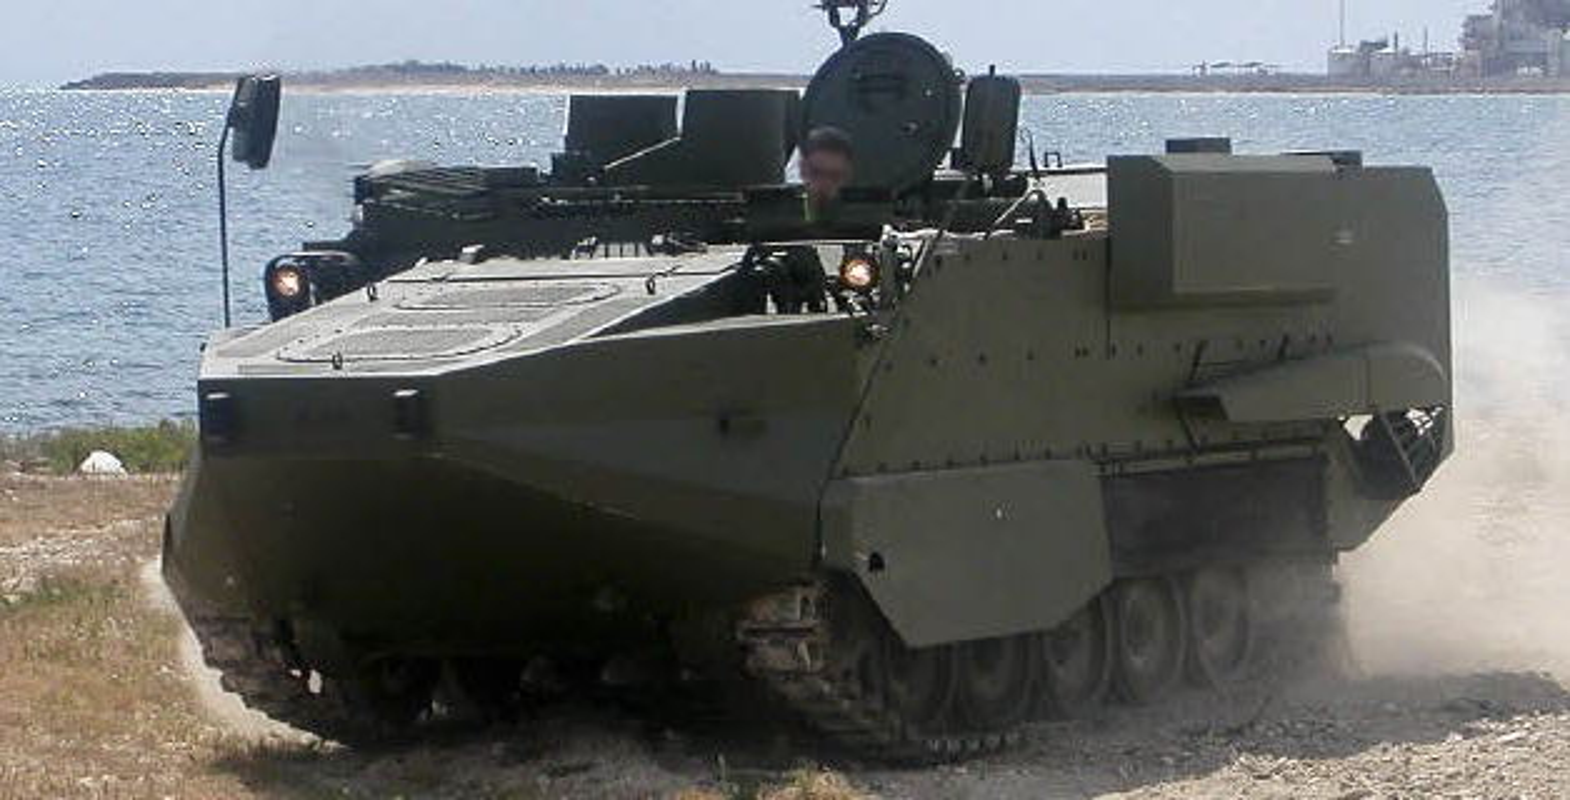 Viet Nam co the cai tien M113 dung cho hai quan danh bo?-Hinh-4